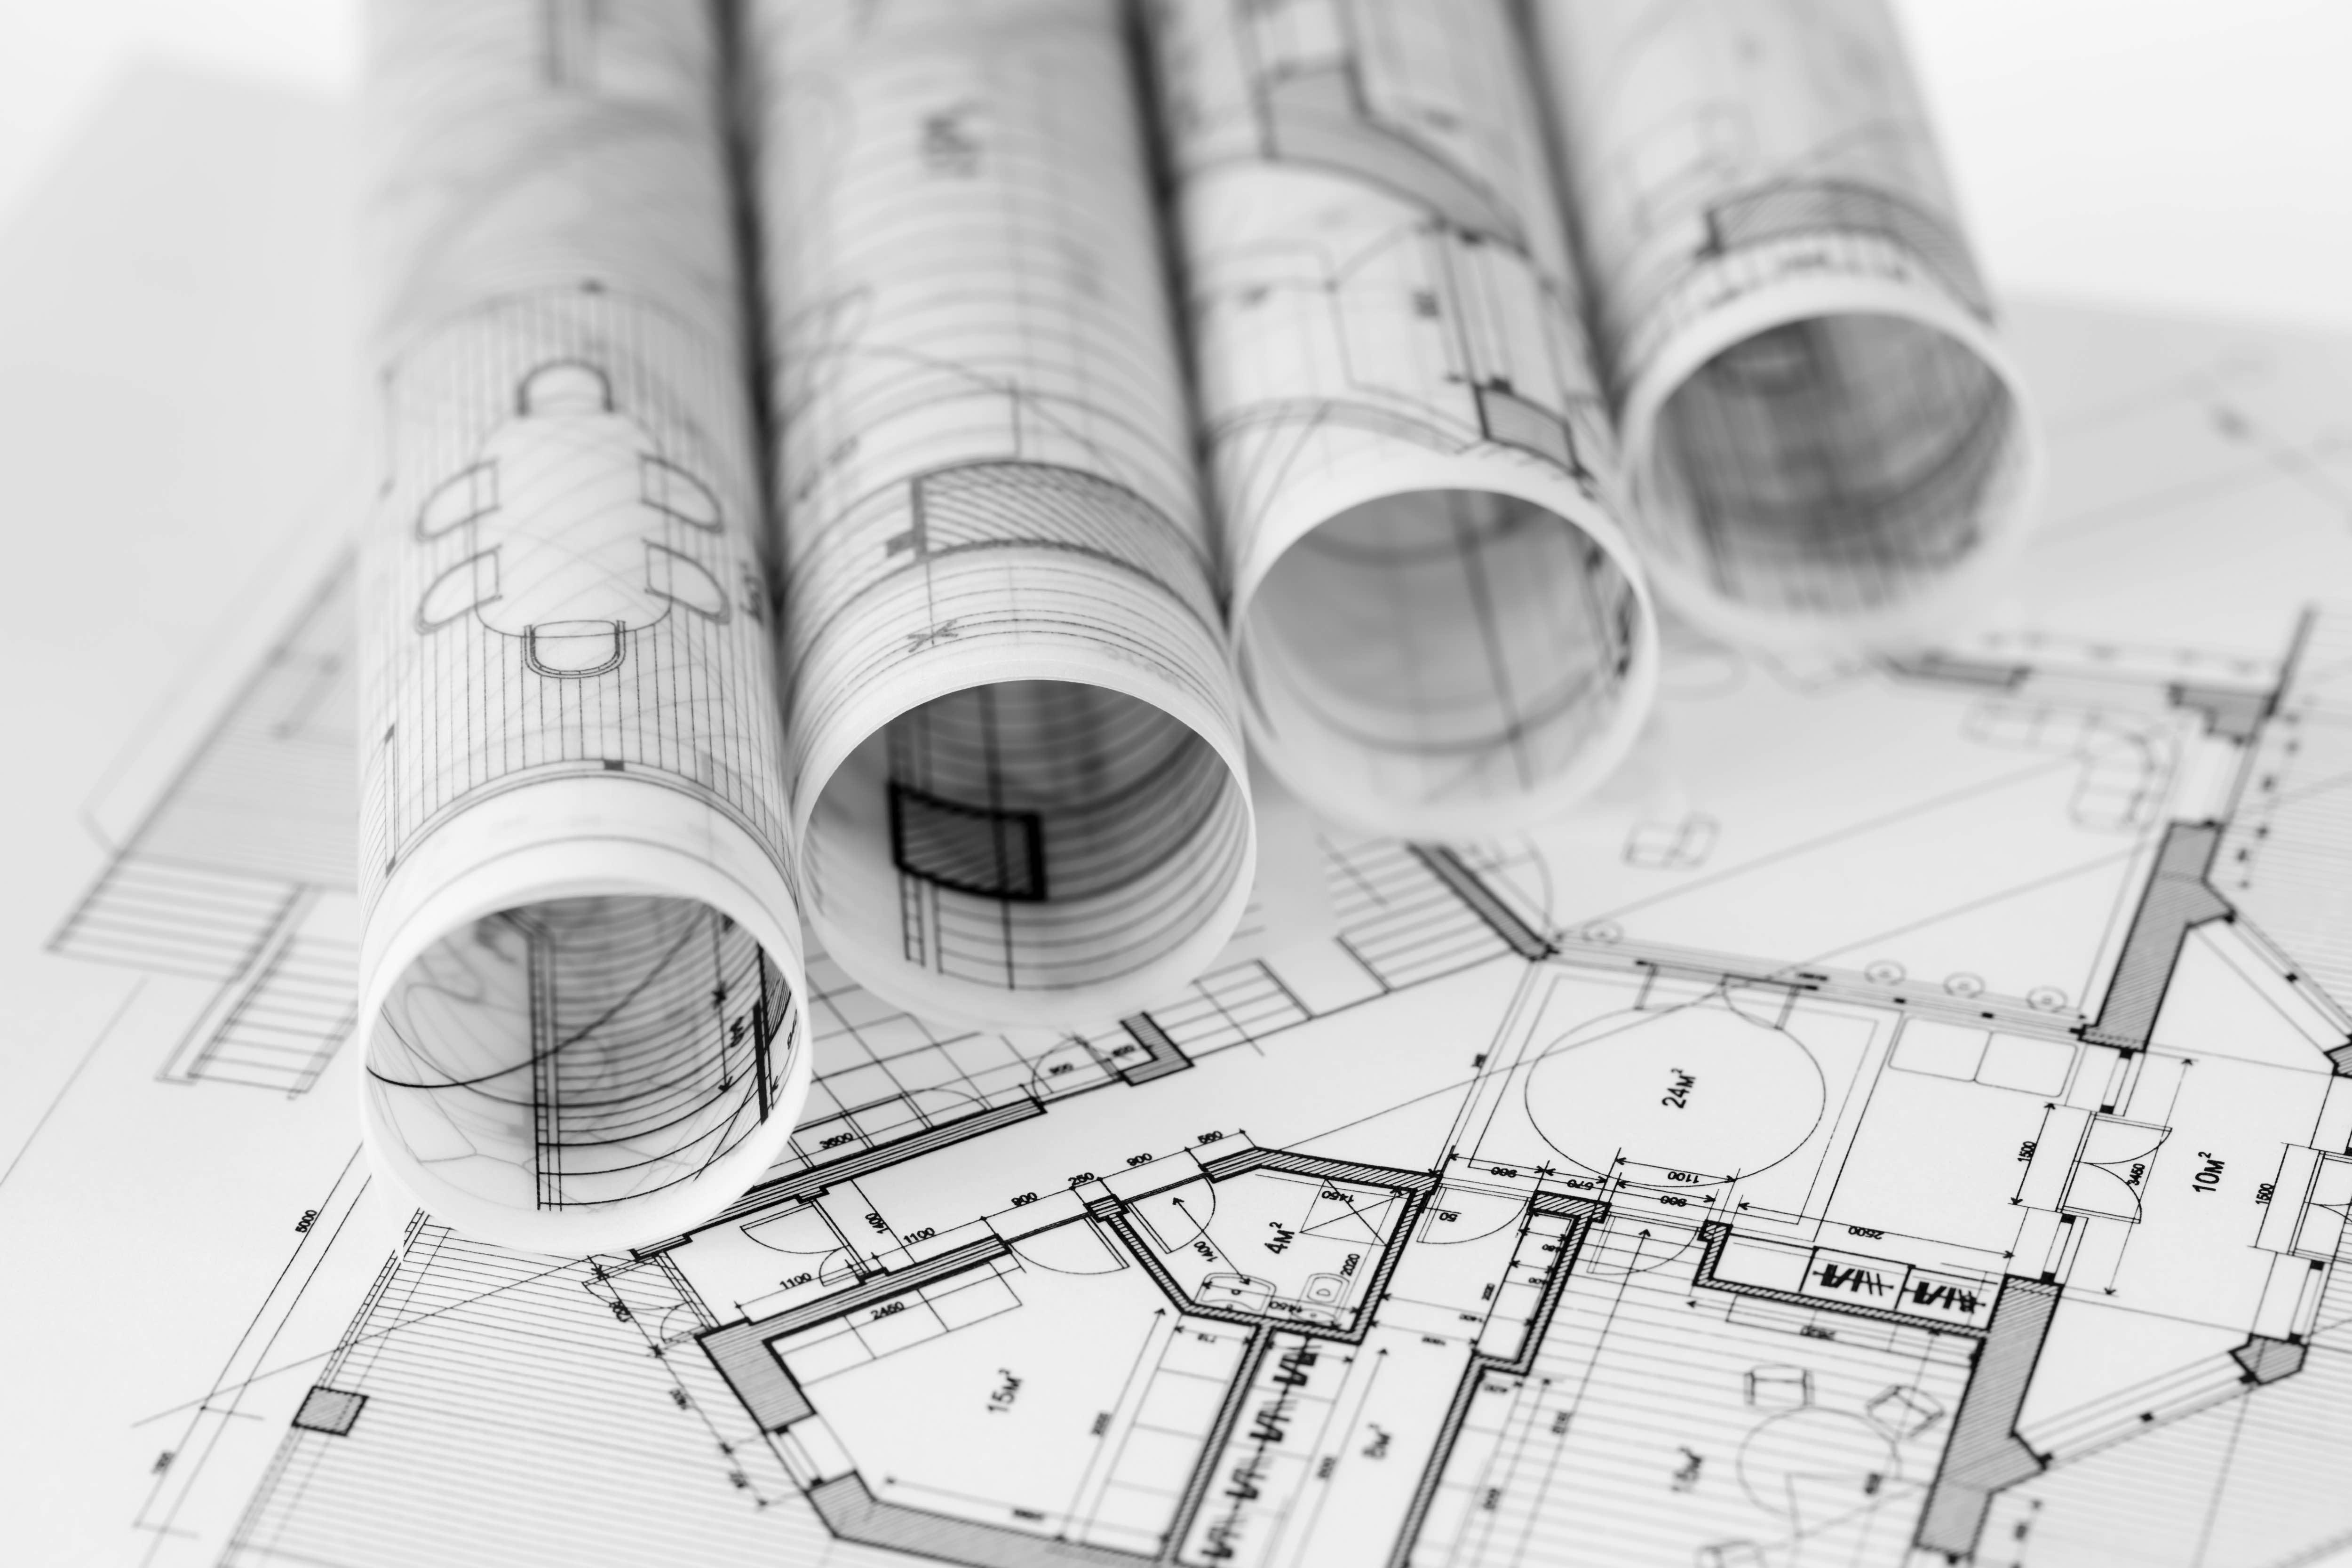 HABAU Handels- und Bau GmbH